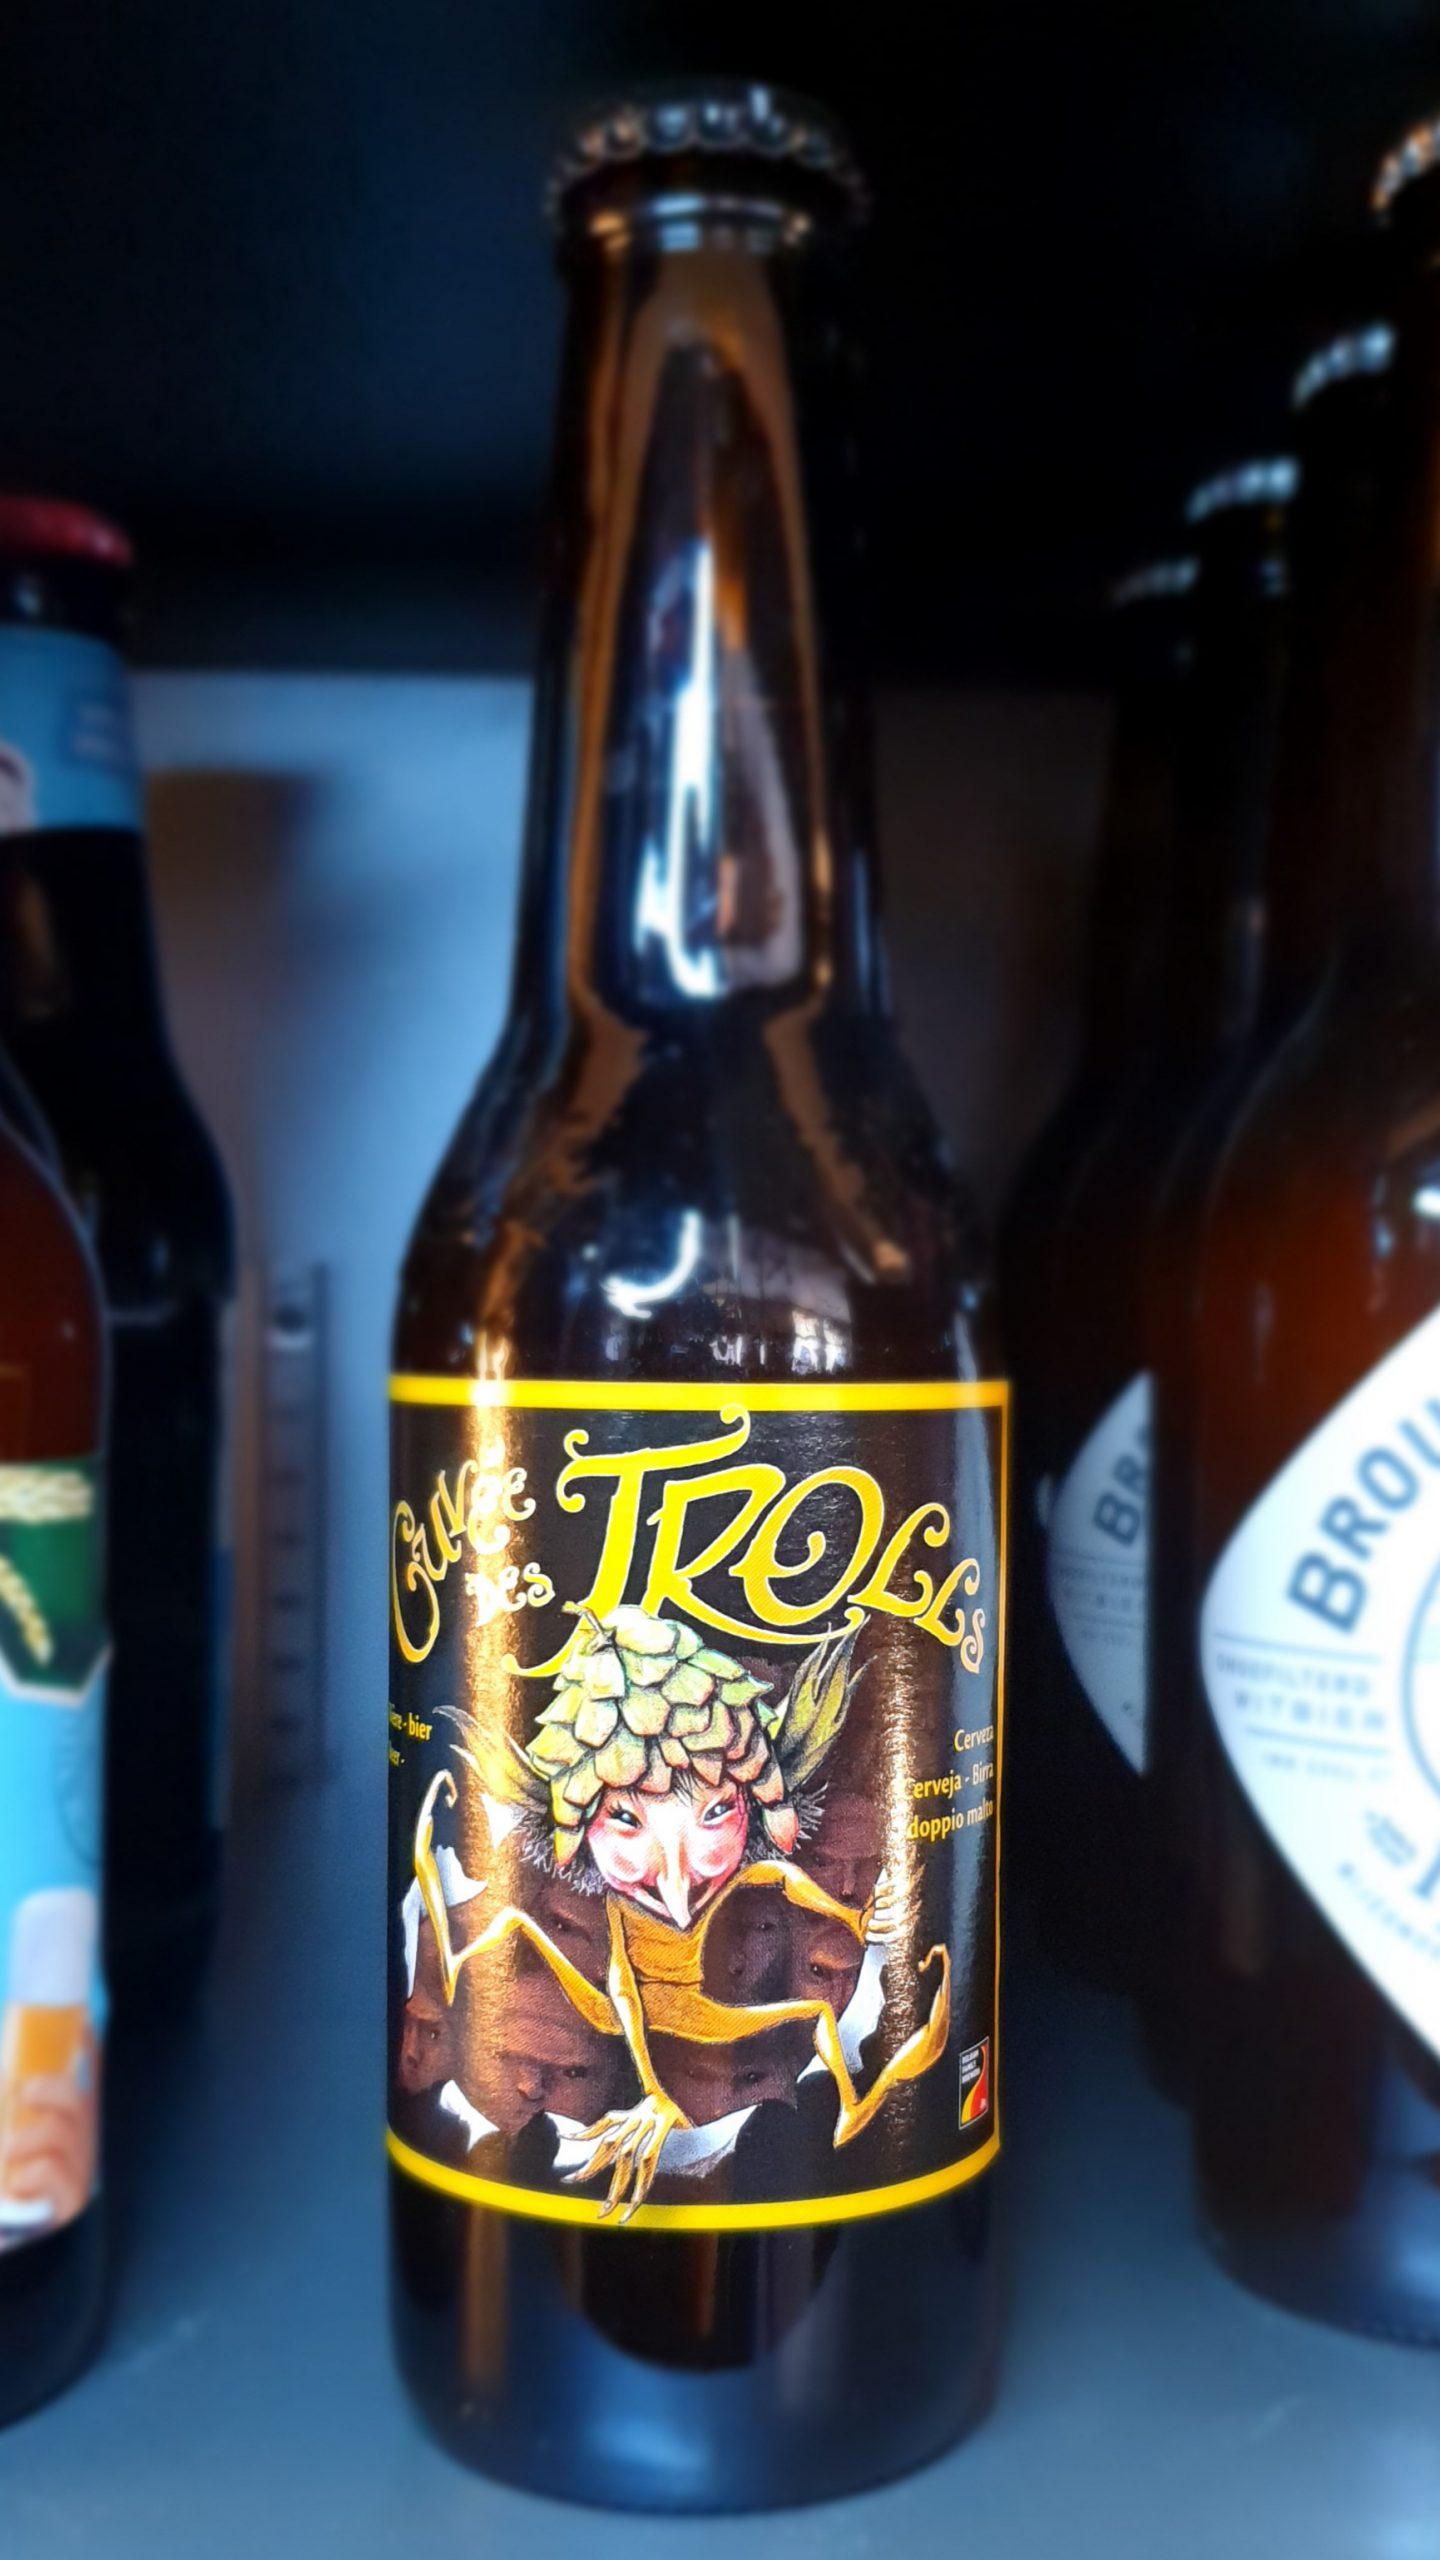 Cuvee des Trolls - brouwerij Dubuisson